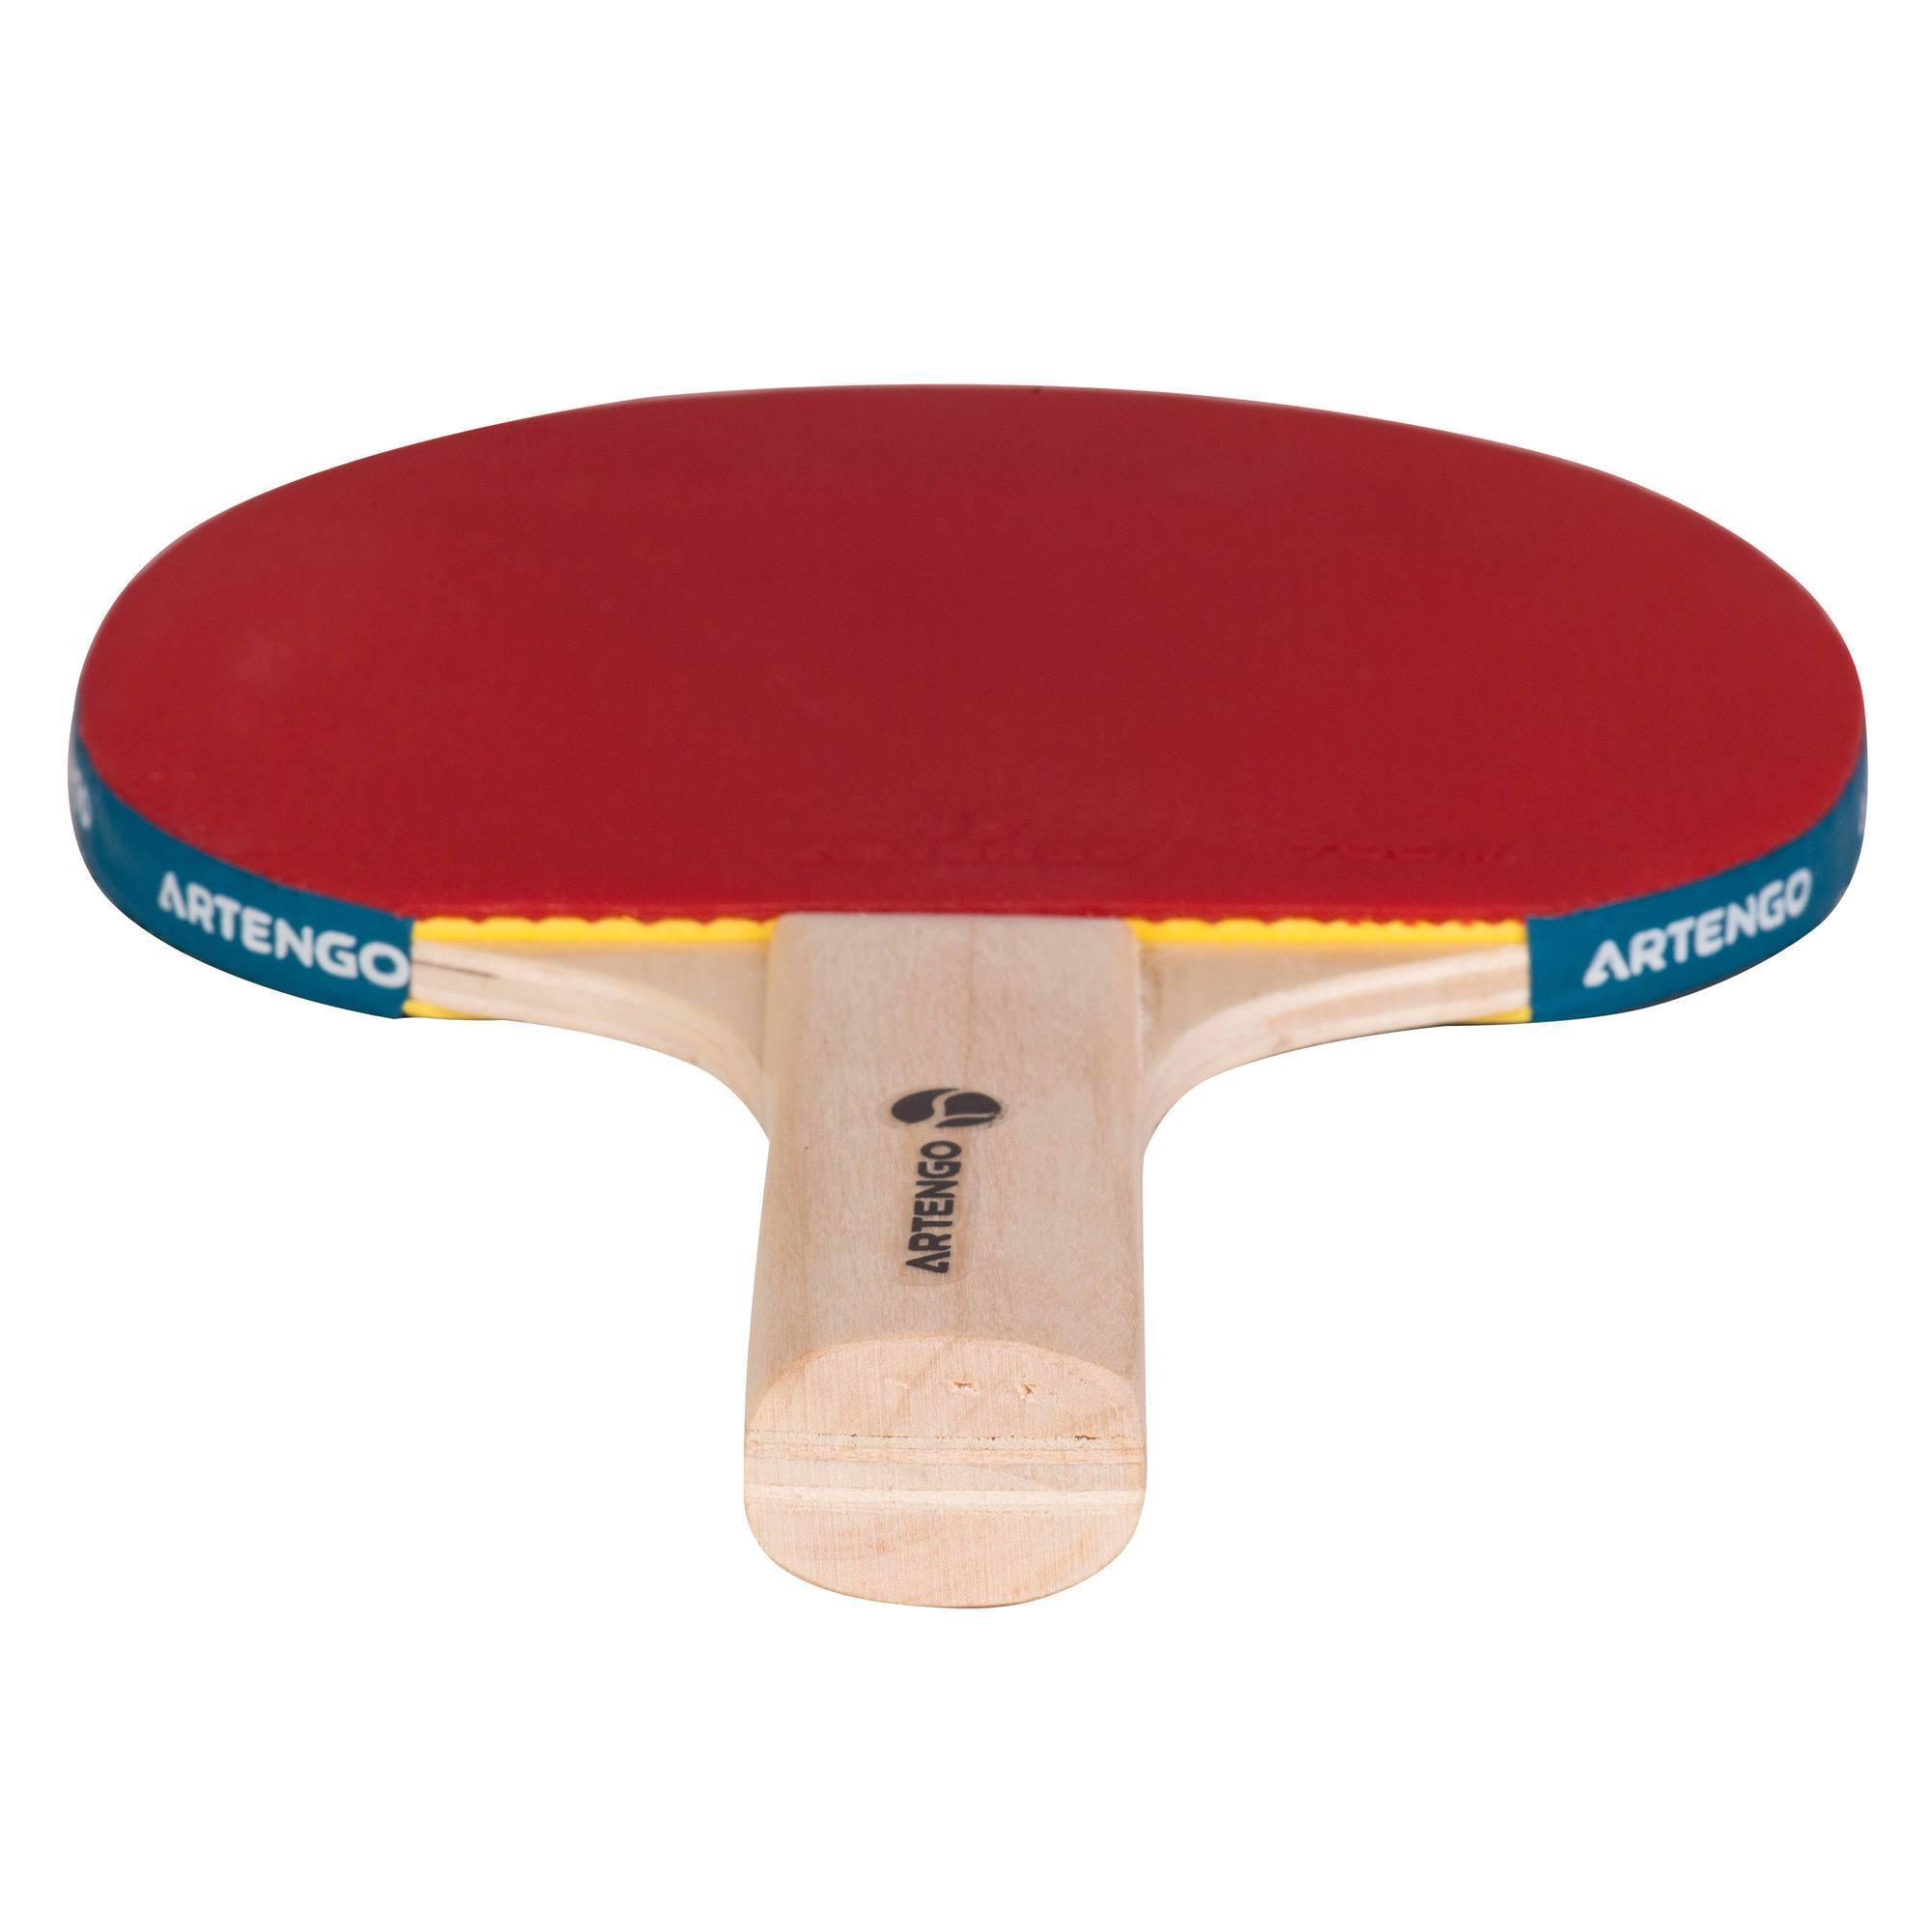 Raquette de tennis de table artengo fr 700 clubs collectivit s decathlon pro - Raquette de tennis de table decathlon ...